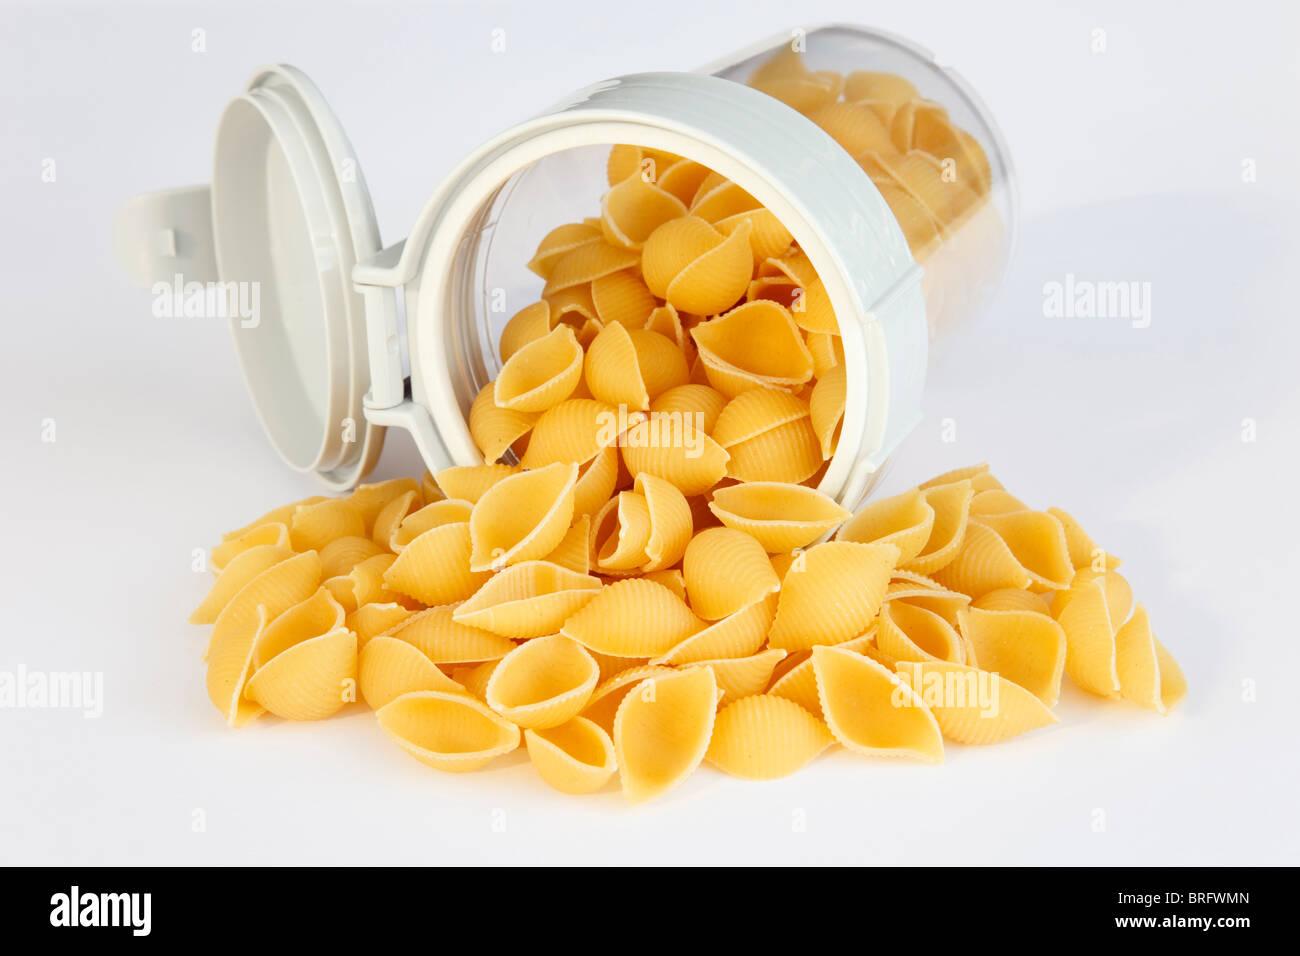 Montón de conchas de pasta Conchiglie crudos derramándose de un contenedor de comida de plástico Imagen De Stock